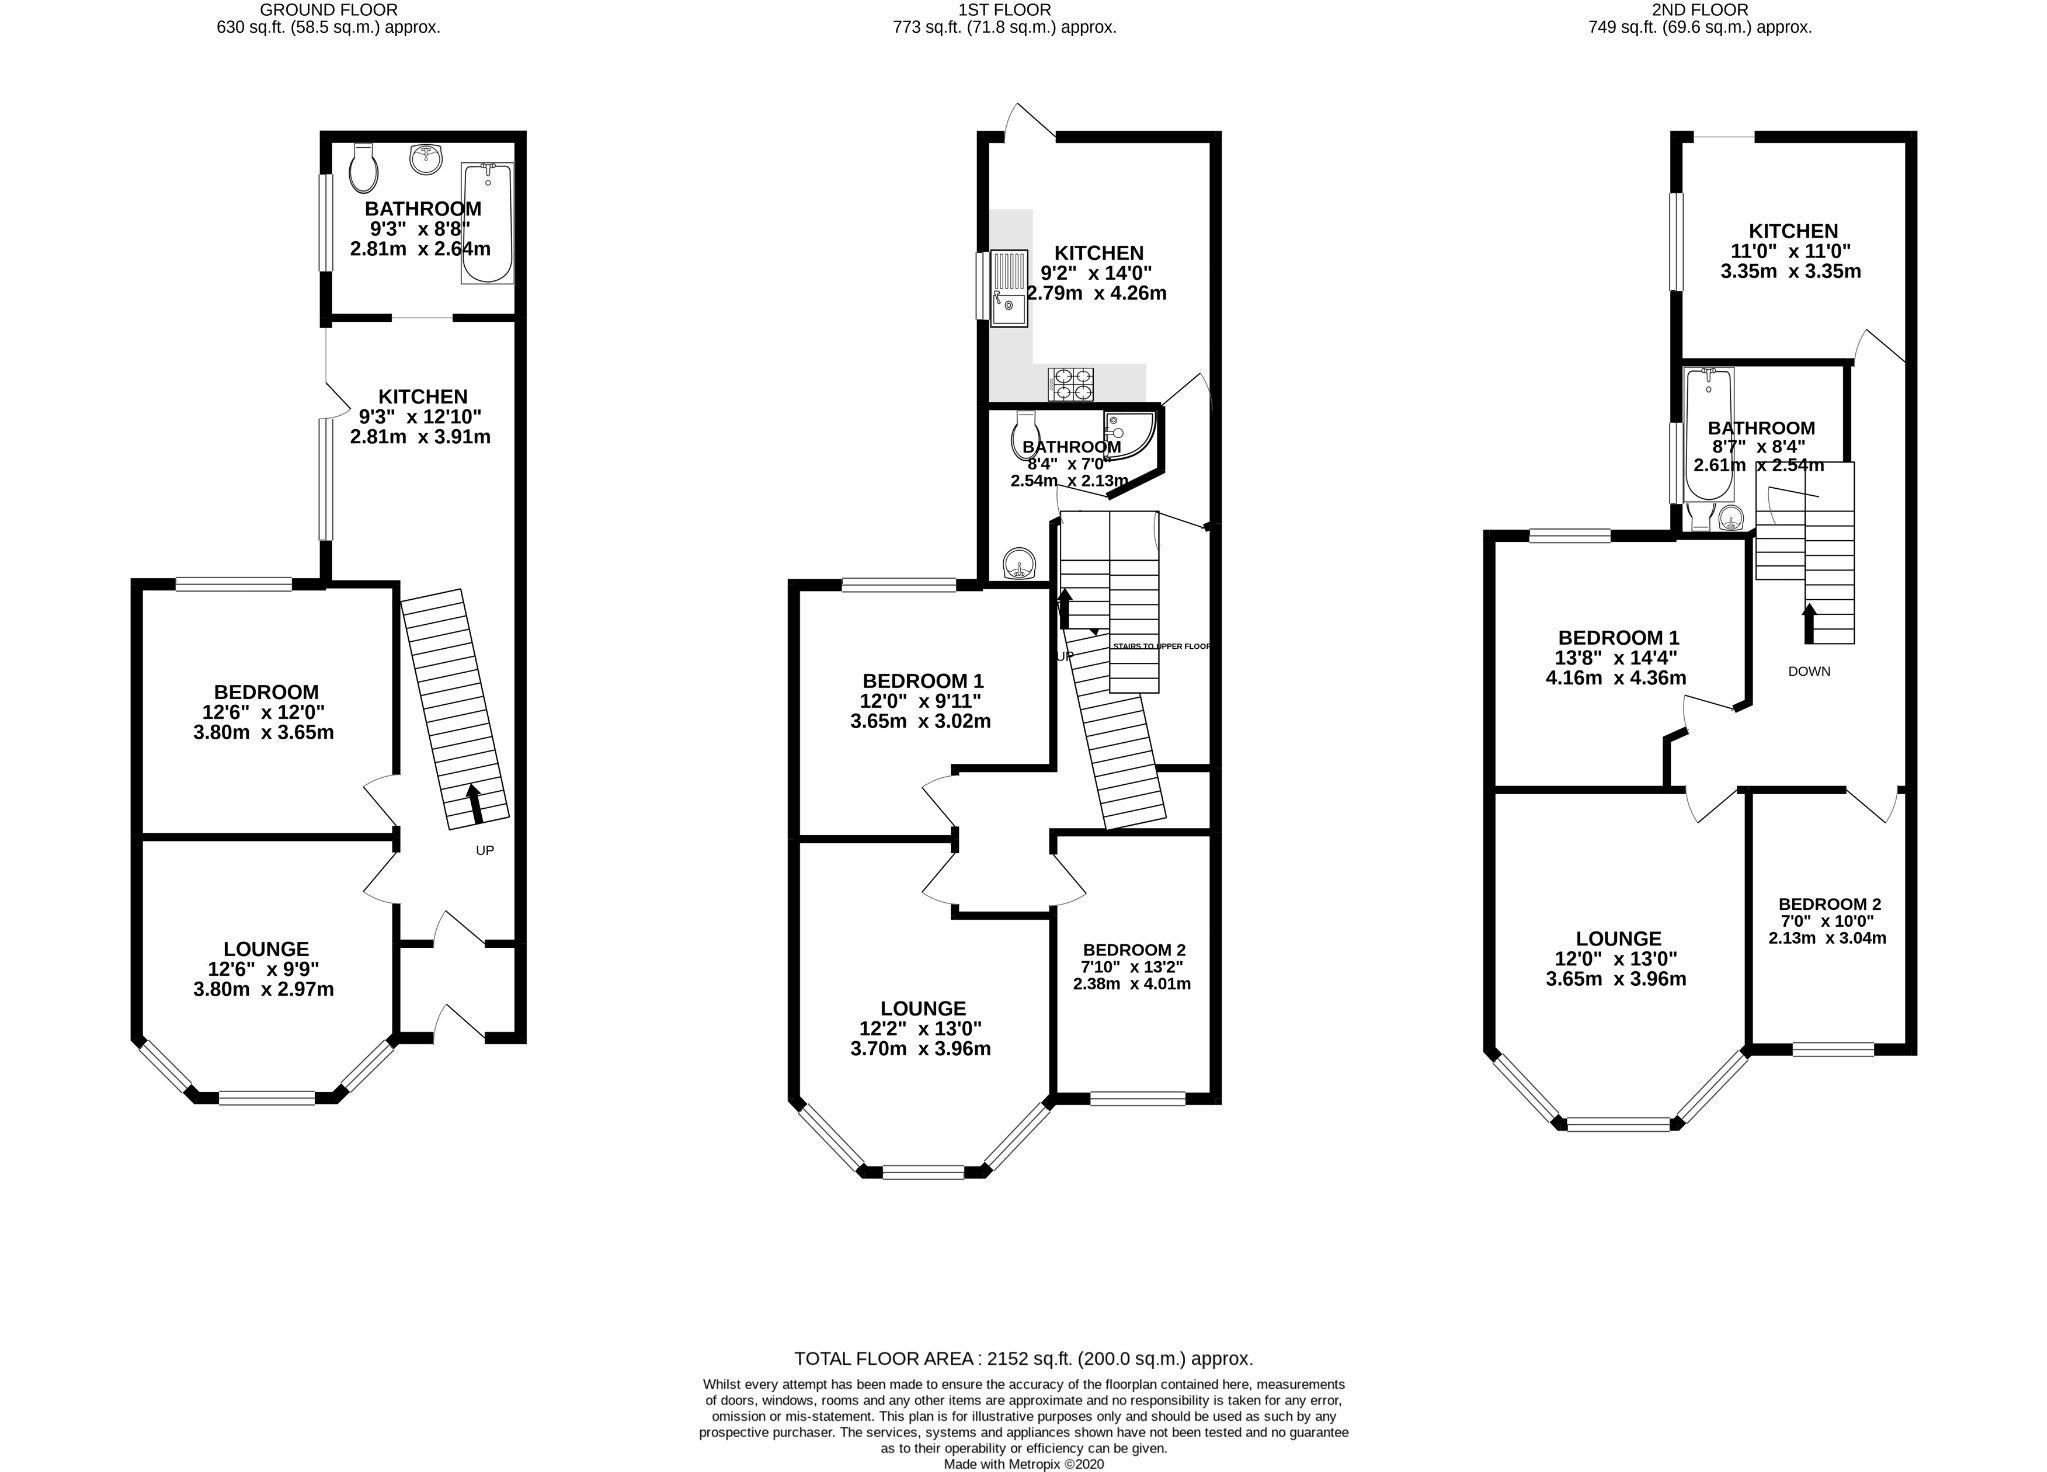 5 bedroom flat flat/apartment For Sale in Onchan - Floorplan 1